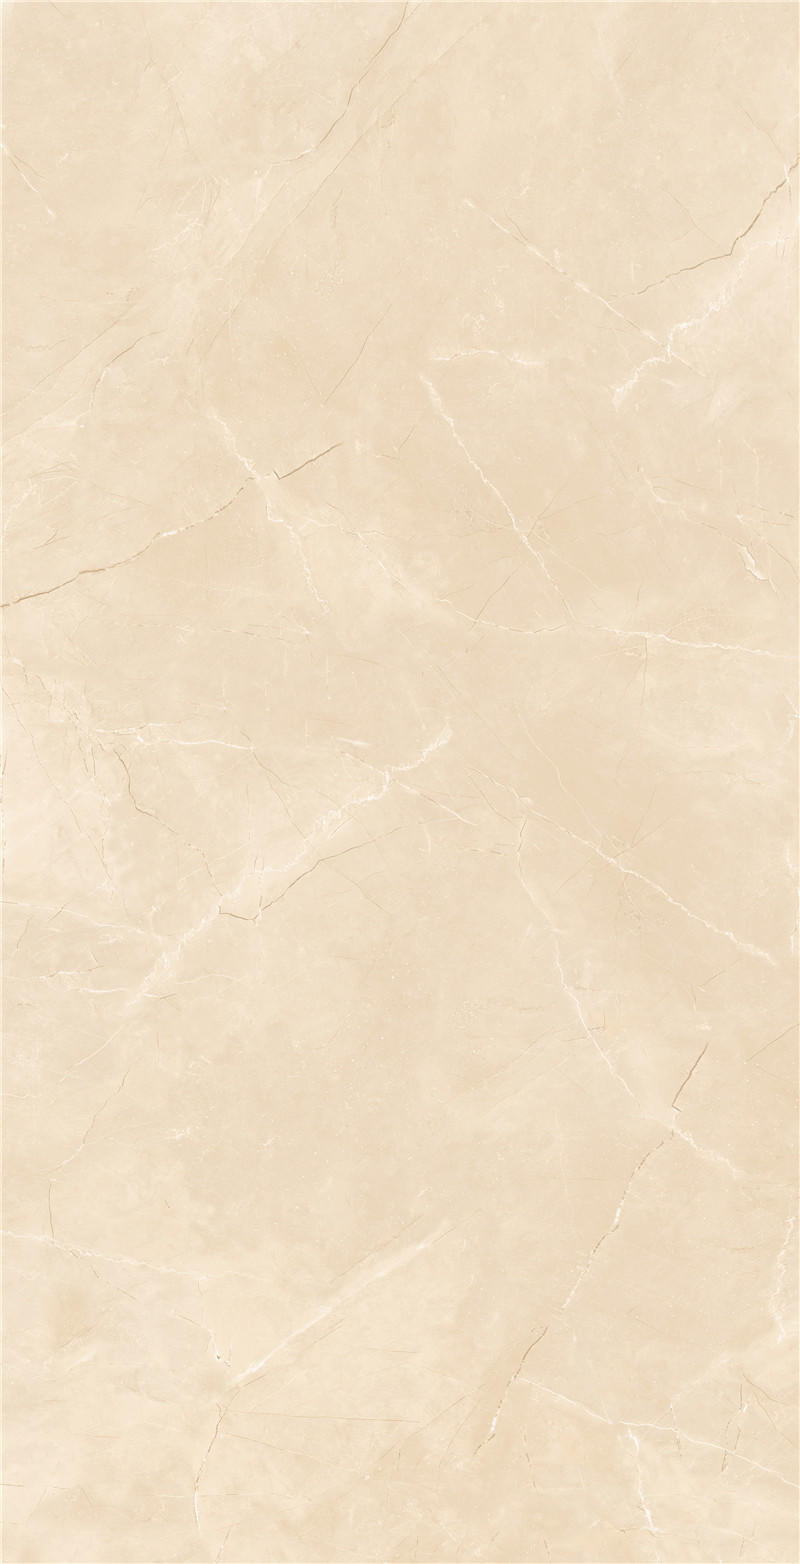 tile effect laminate flooring p158035m dh156r6a07 glazed porcelain tile surface LONGFAVOR Brand